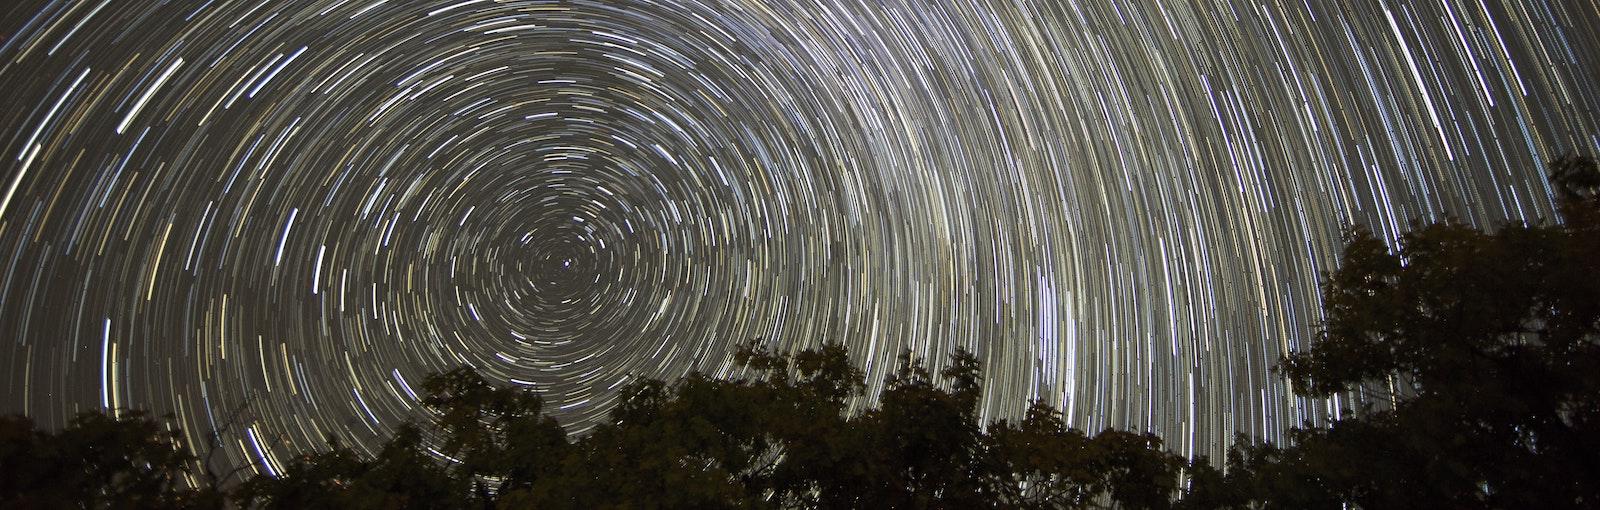 Timelapse of night sky